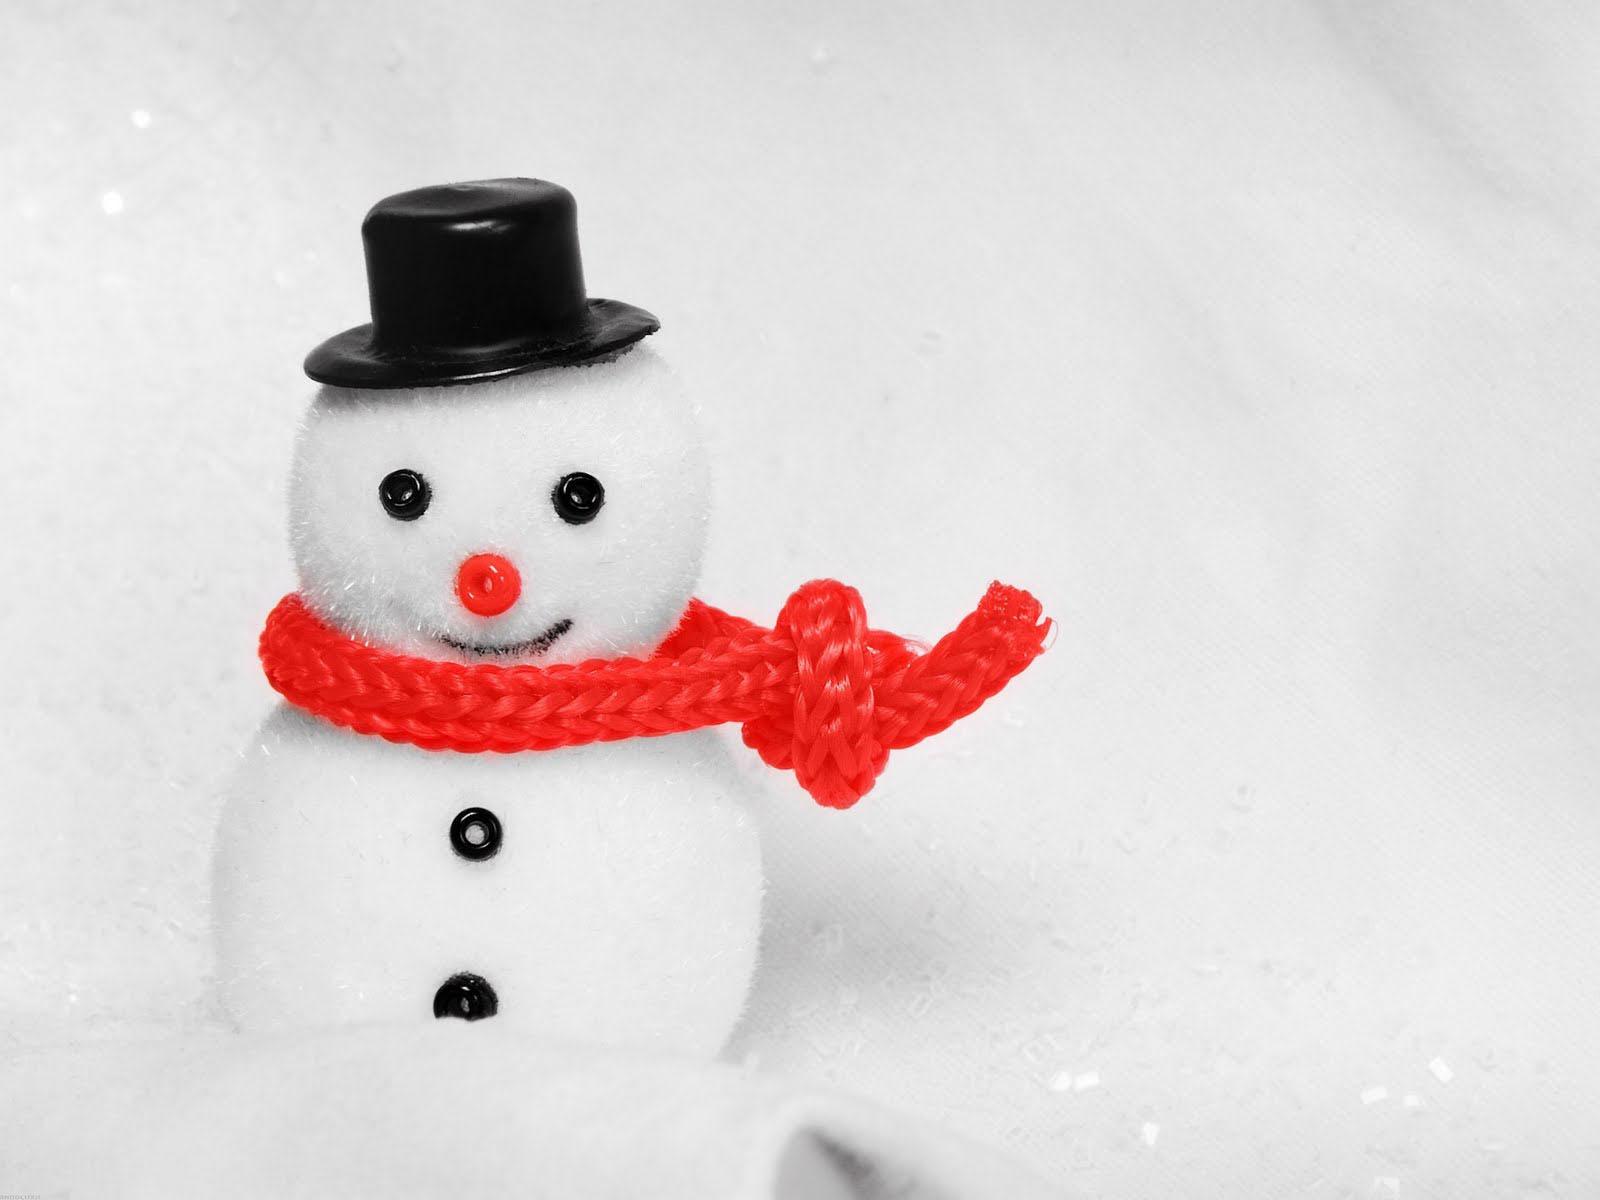 Christmas Snowman Wallpaper hd gallery